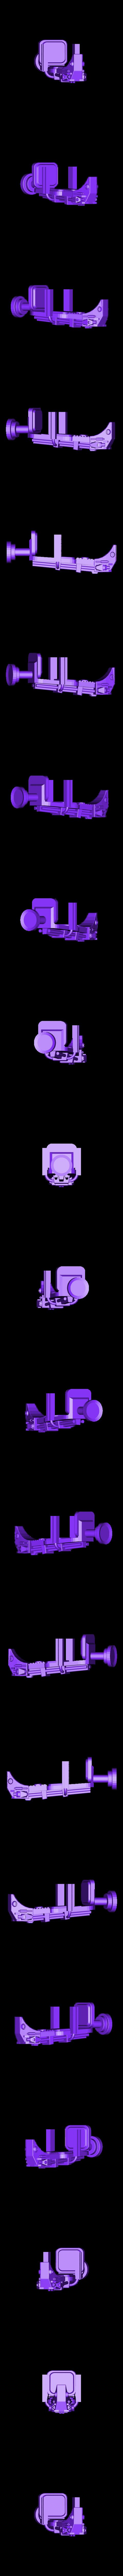 CP_04 (rep).stl Download free STL file Millenium Falcon, Cockpit.  • 3D printable object, Alex_x_x_x